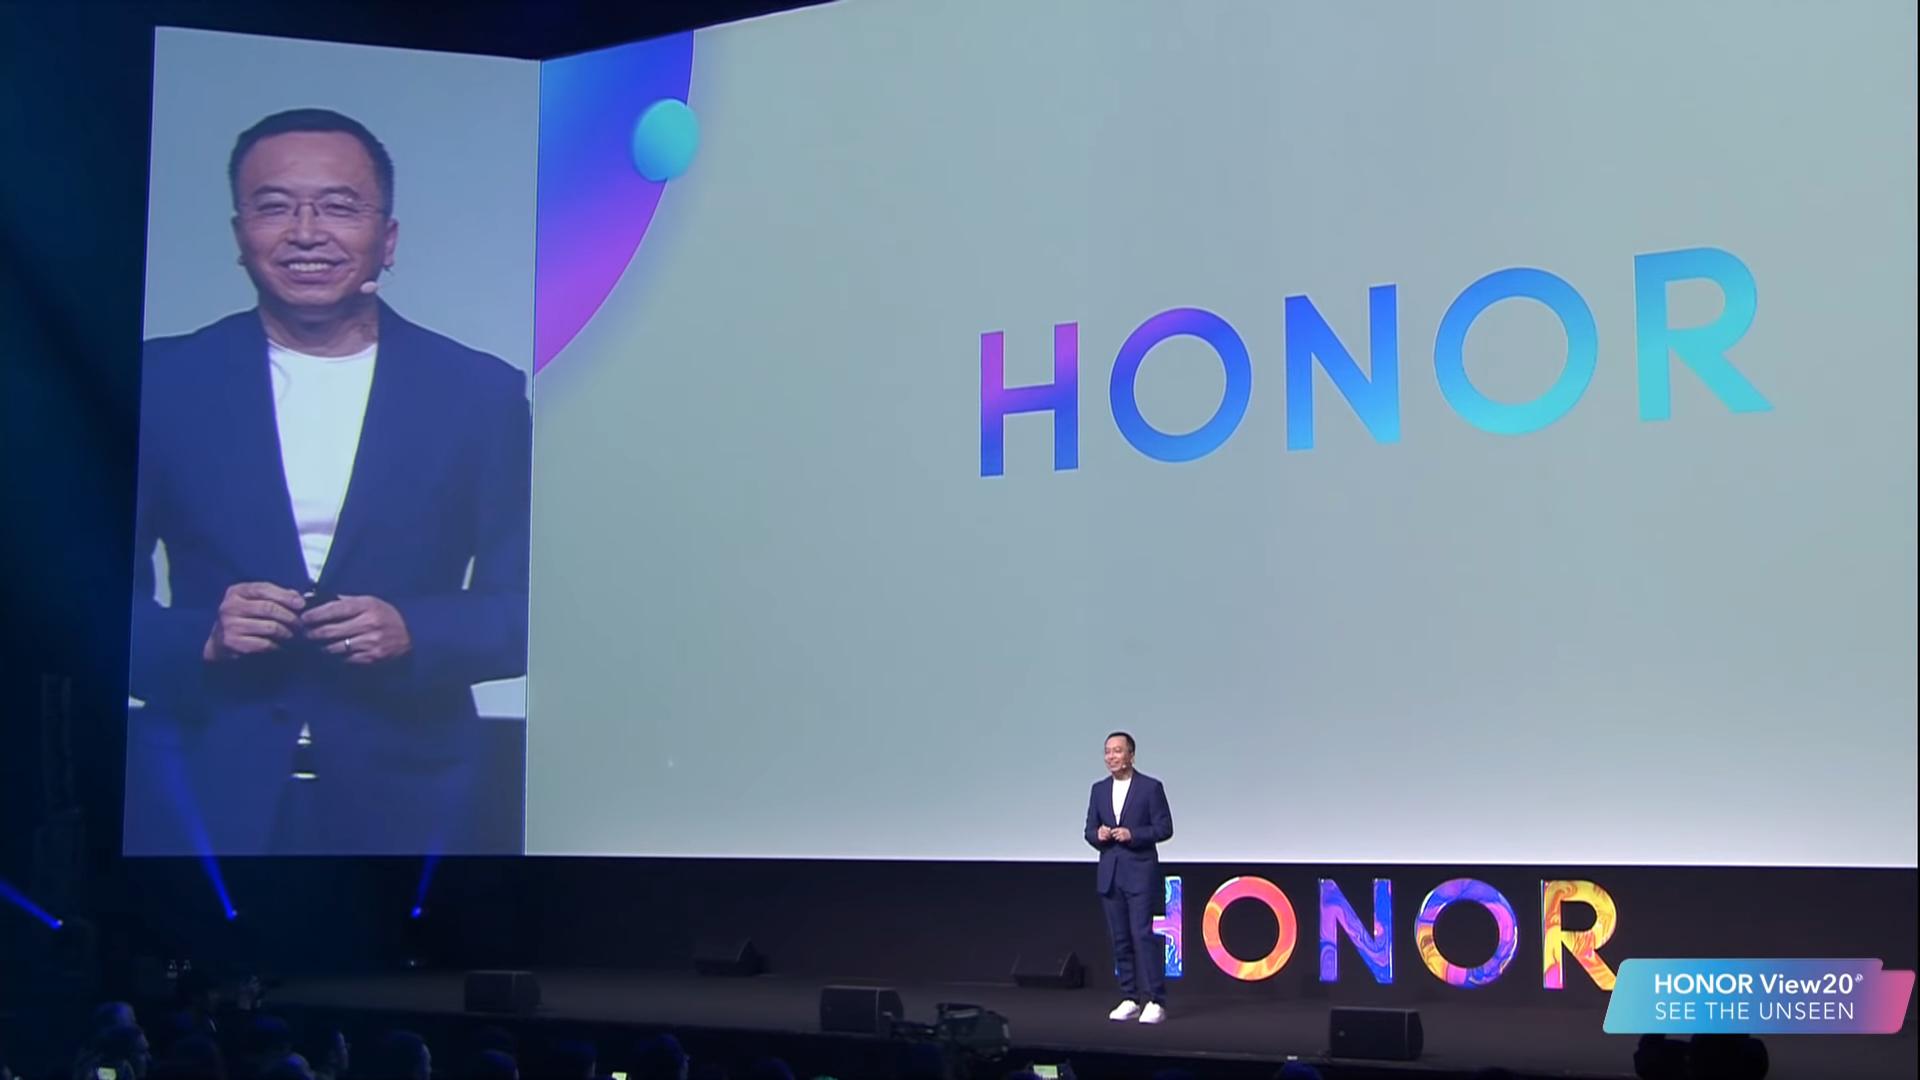 Honor CEO هونر